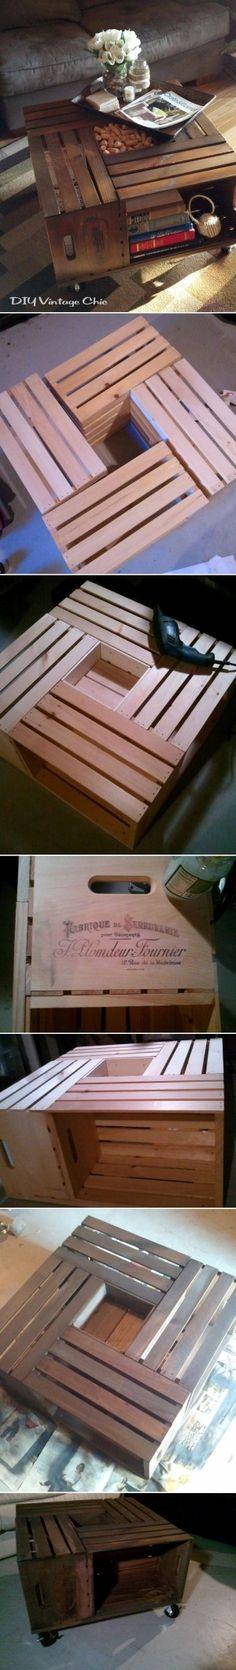 DIY Wine Crate Table DIY Wine Crate Table by diyforever